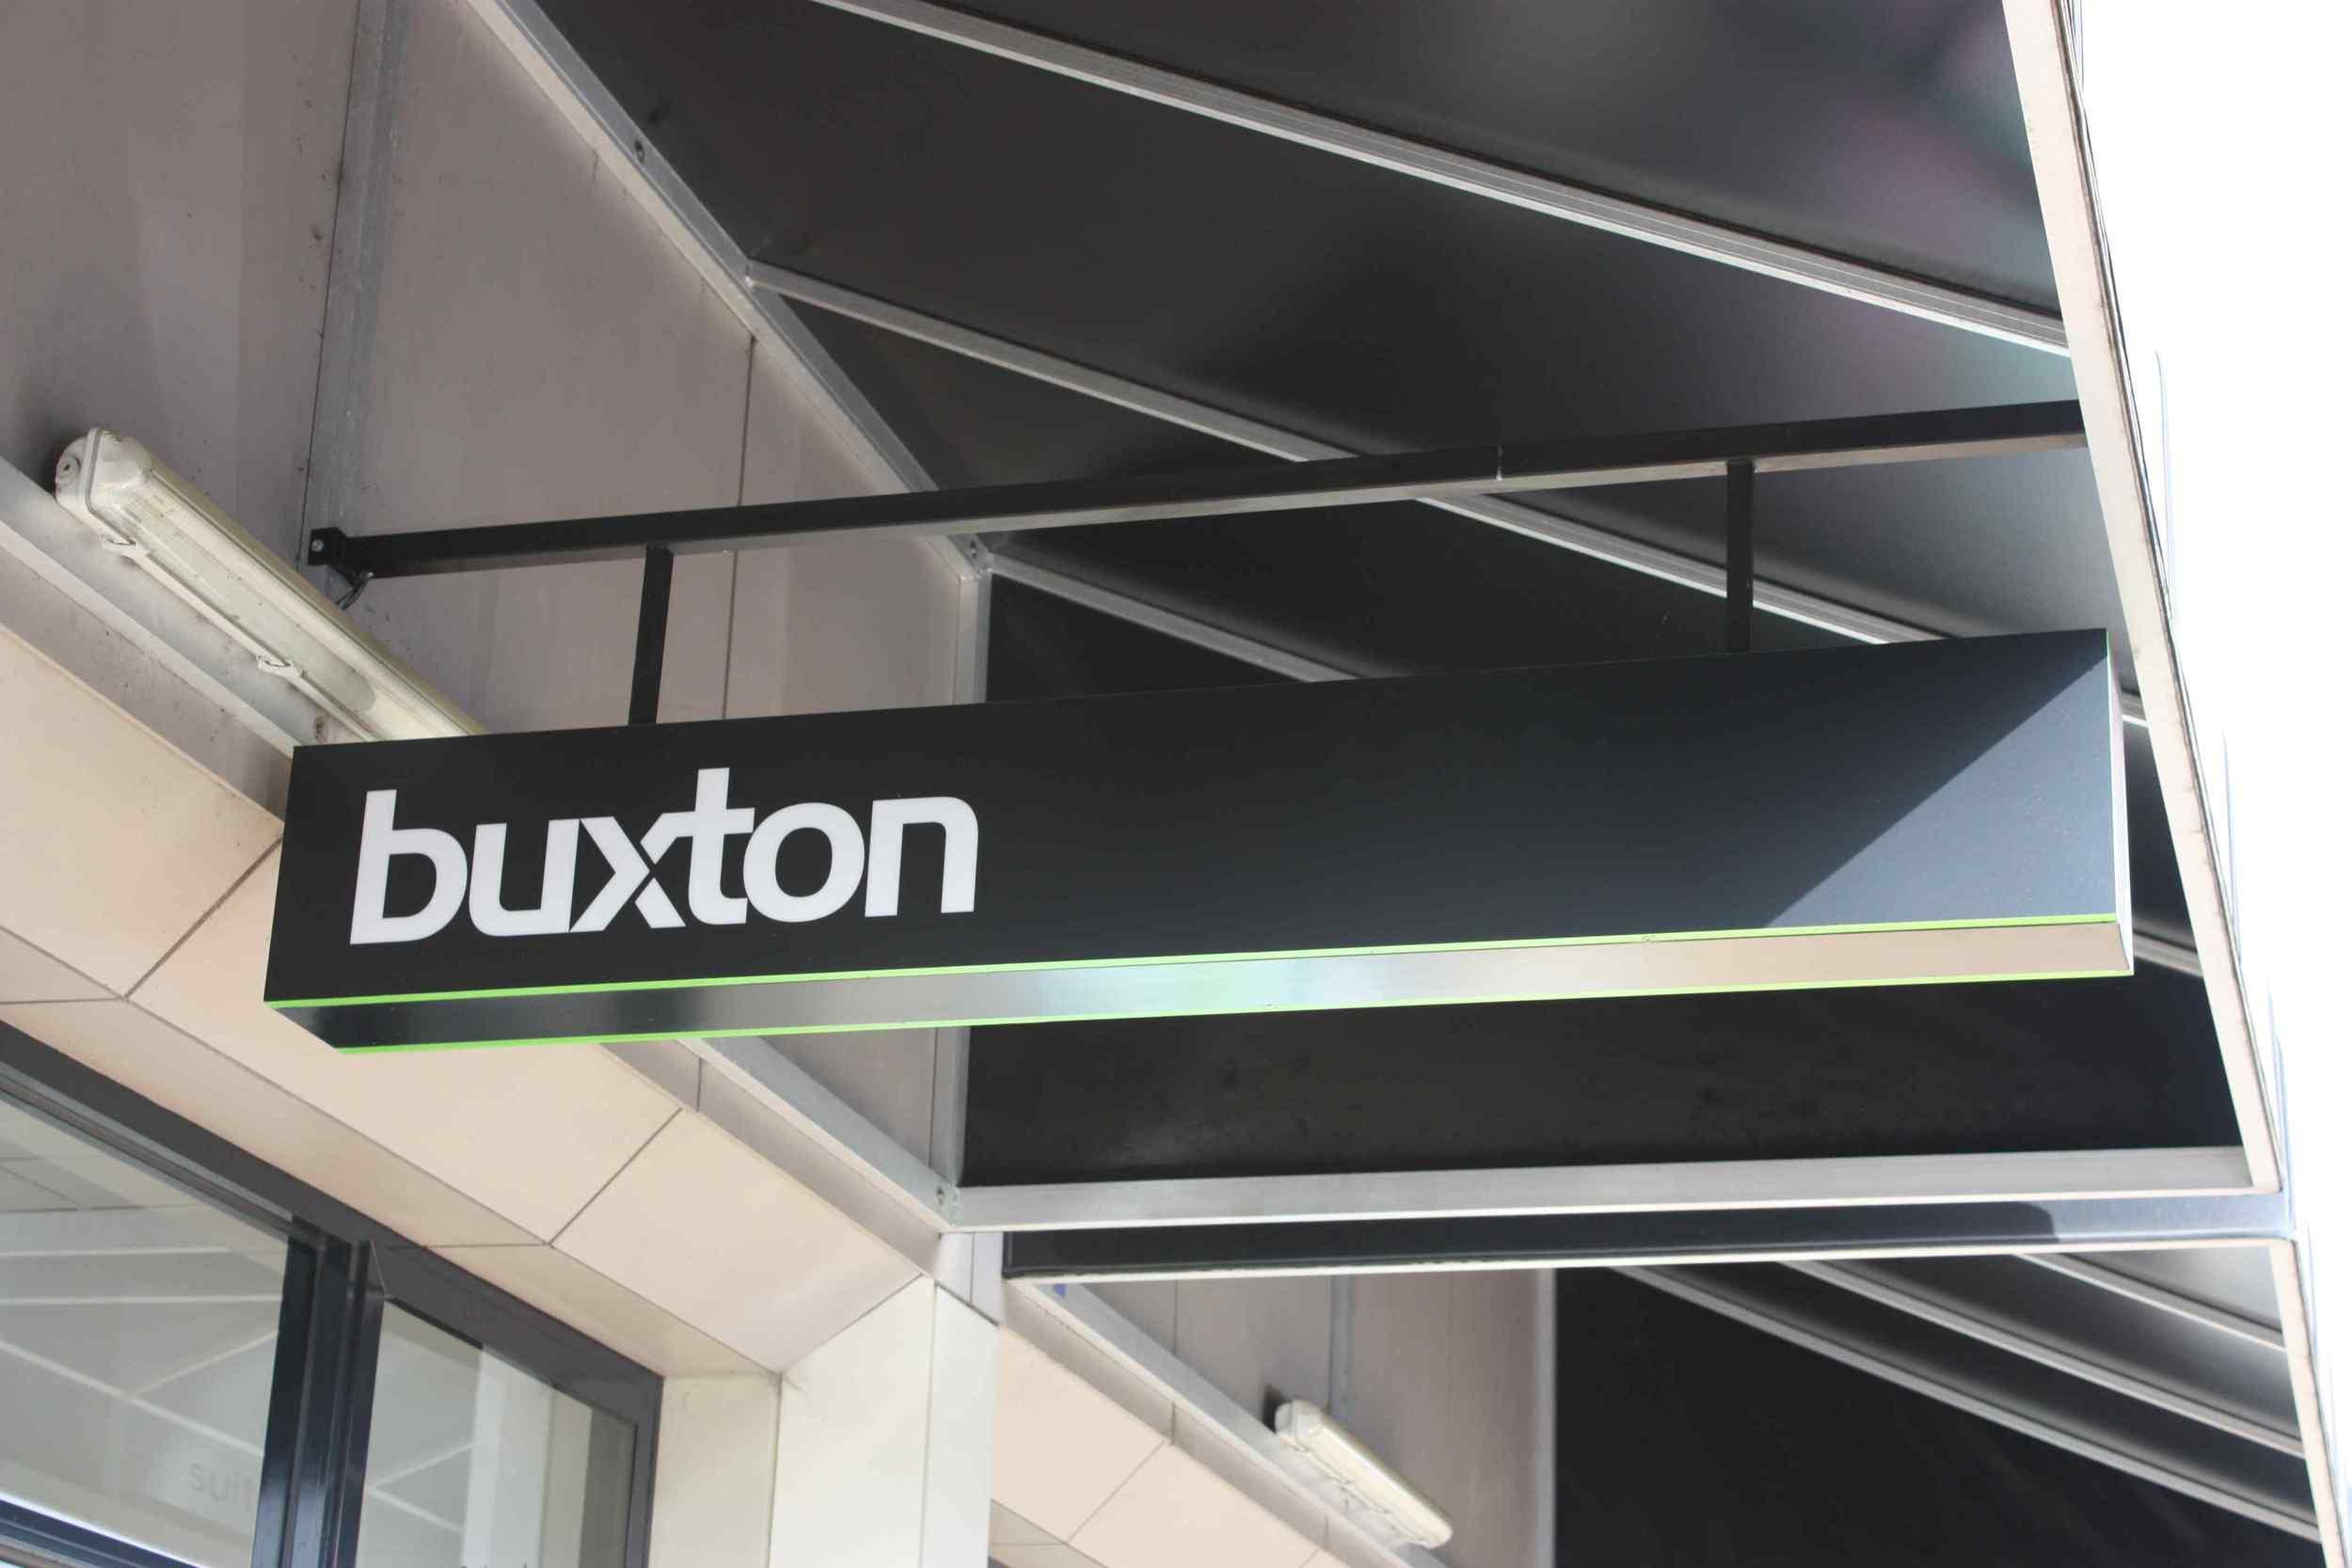 Buxton Under Awning Lightbox Signs Geelong.jpg